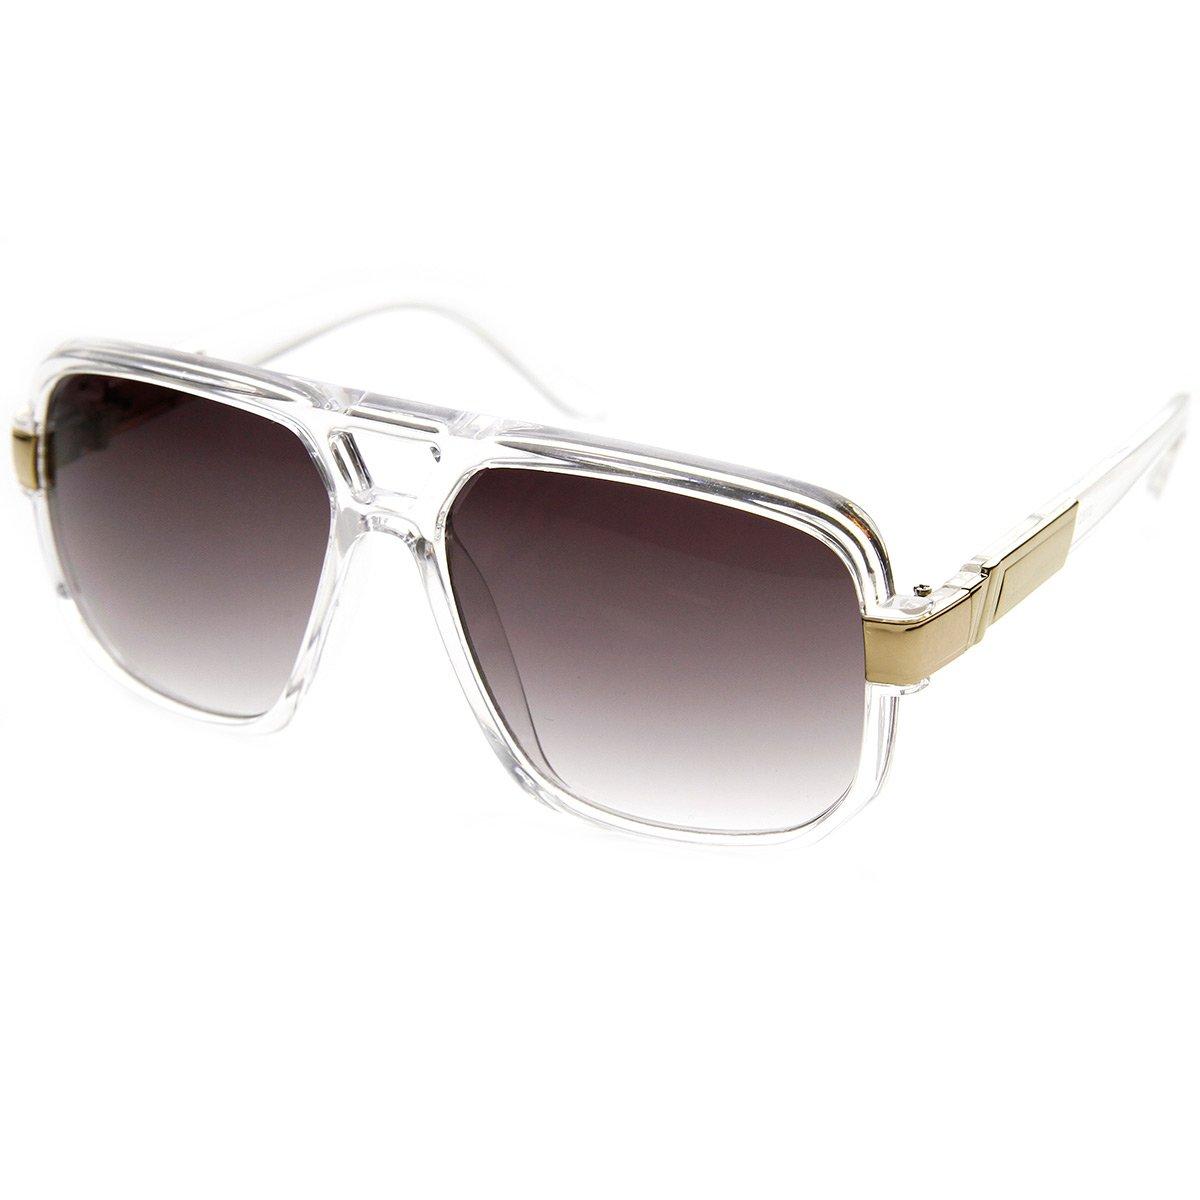 zeroUV - Classic Square Frame Plastic Flat Top Aviator Sunglasses (Clear)